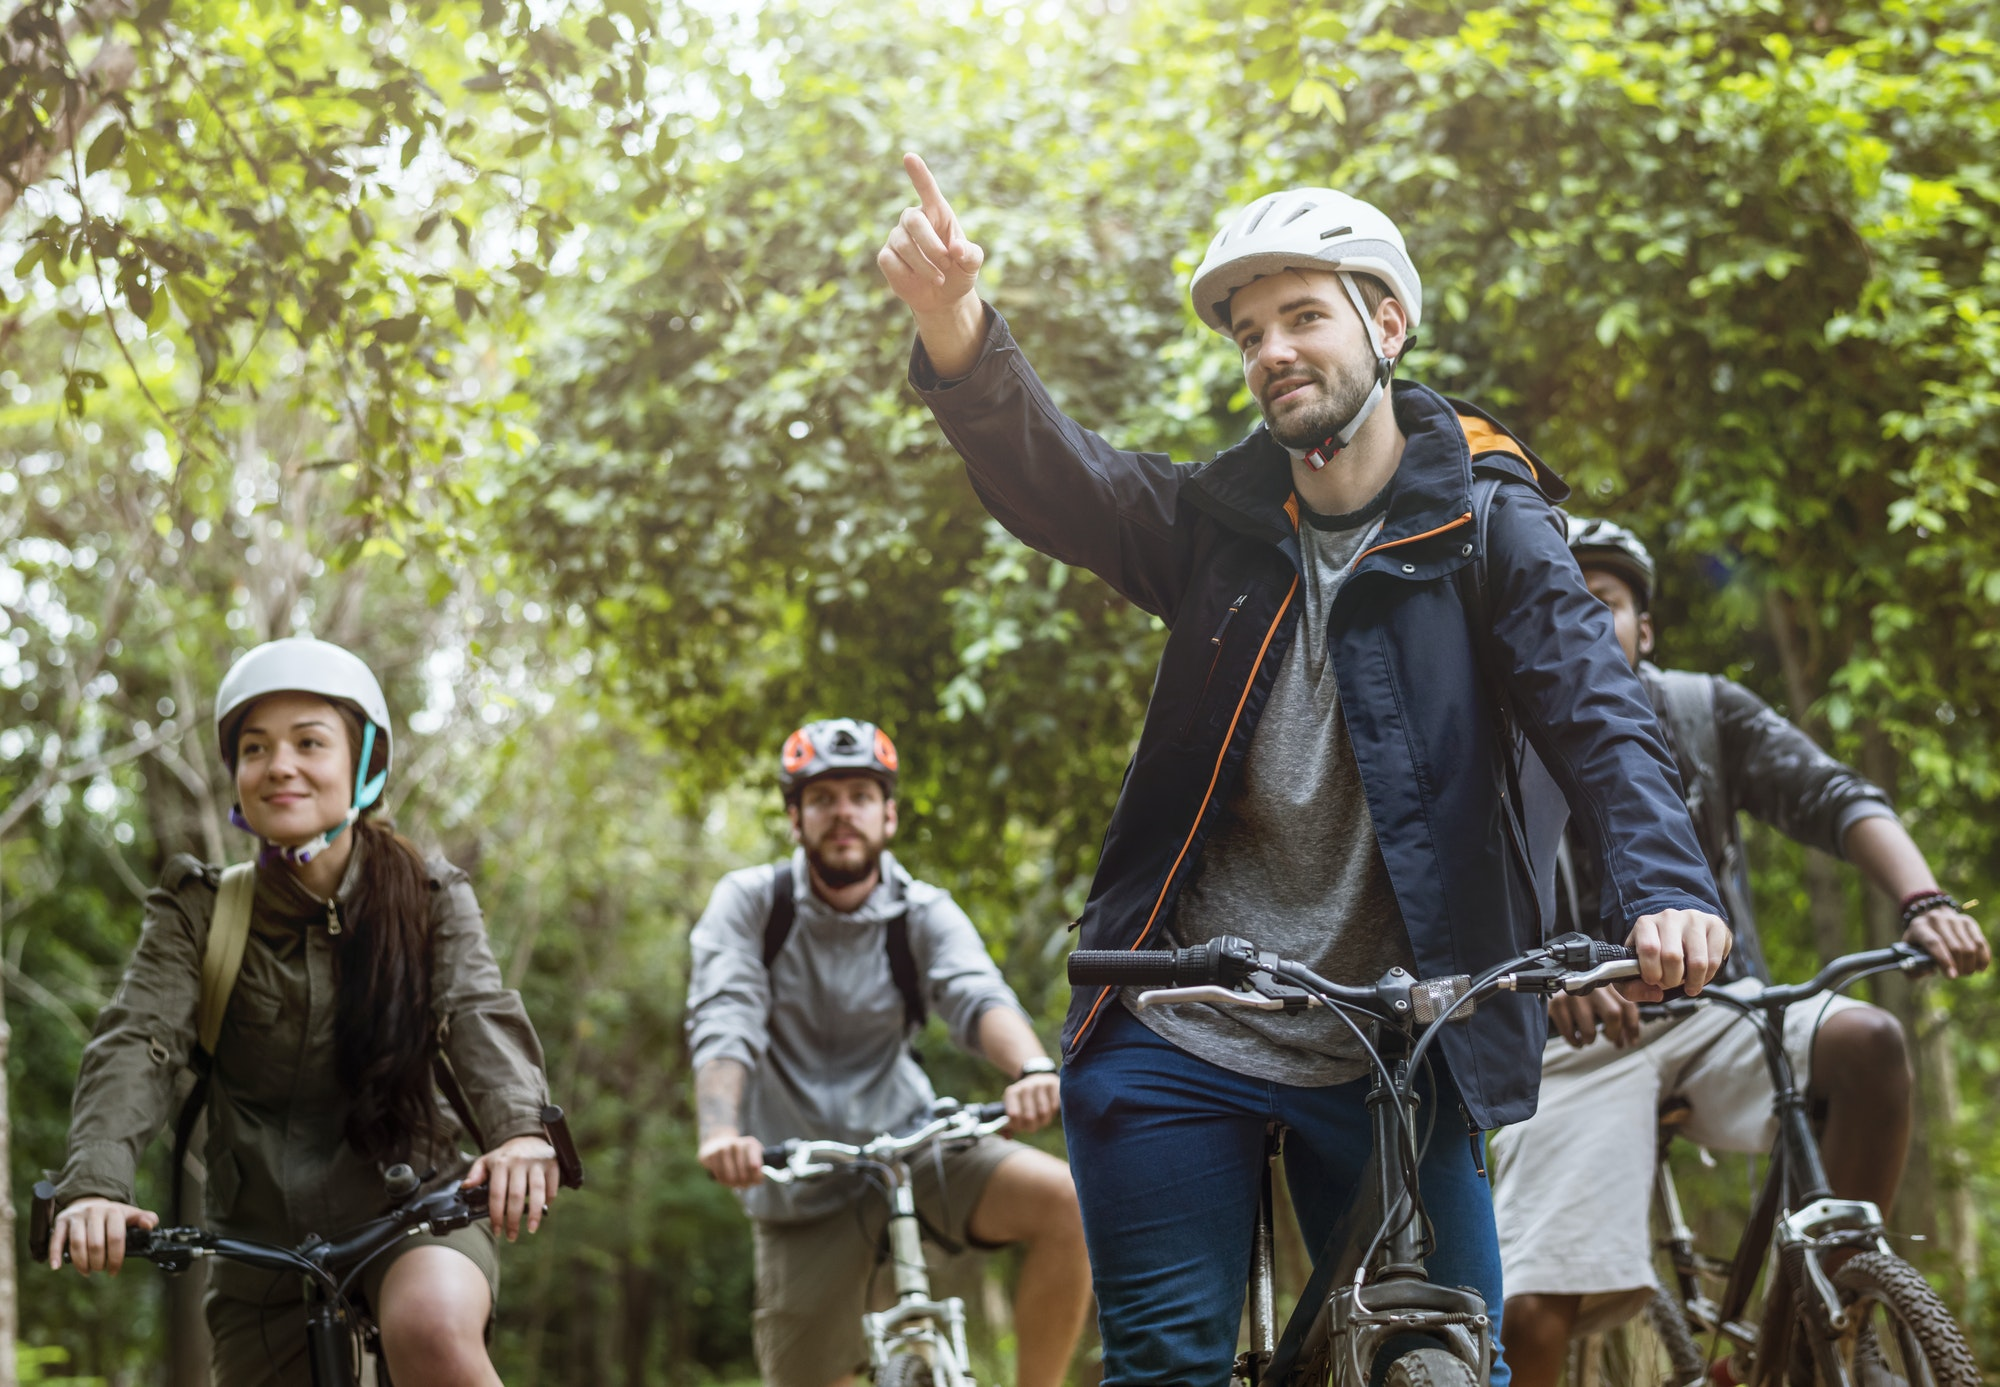 People biking together